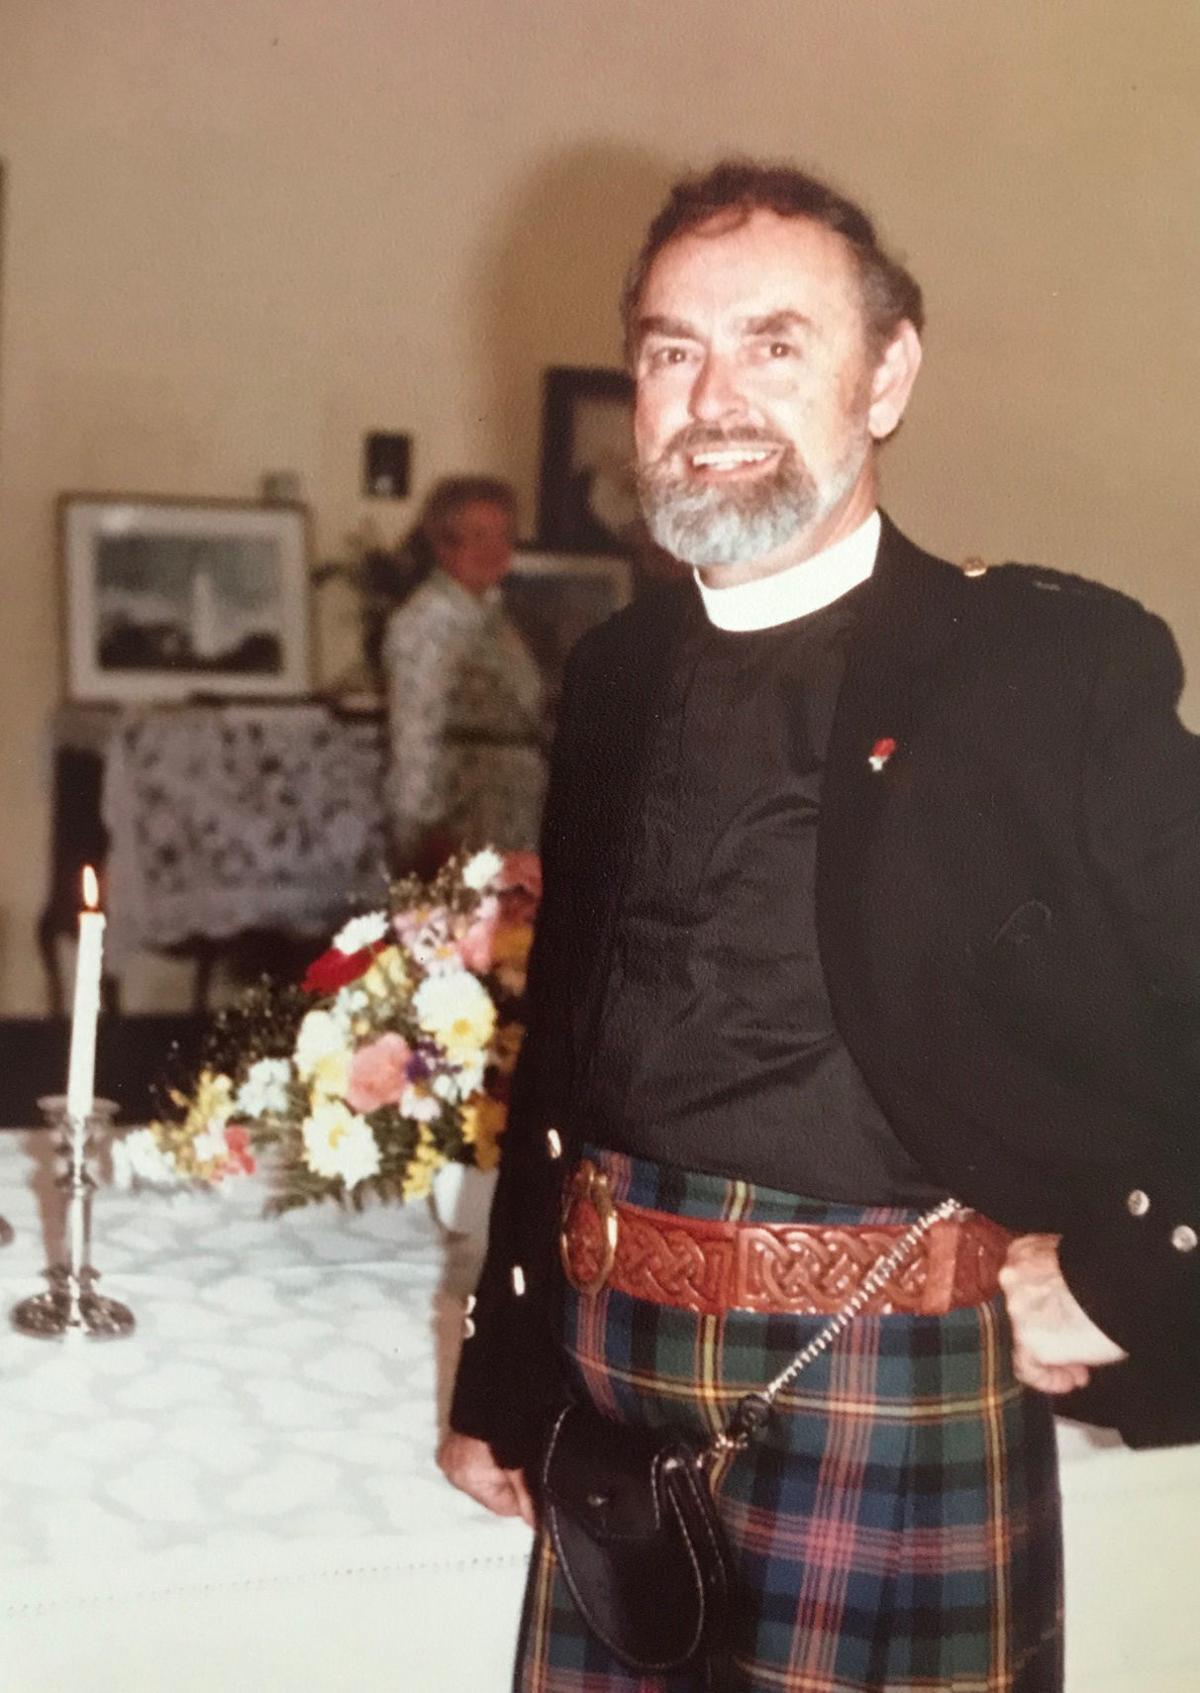 Father Mac in kilt